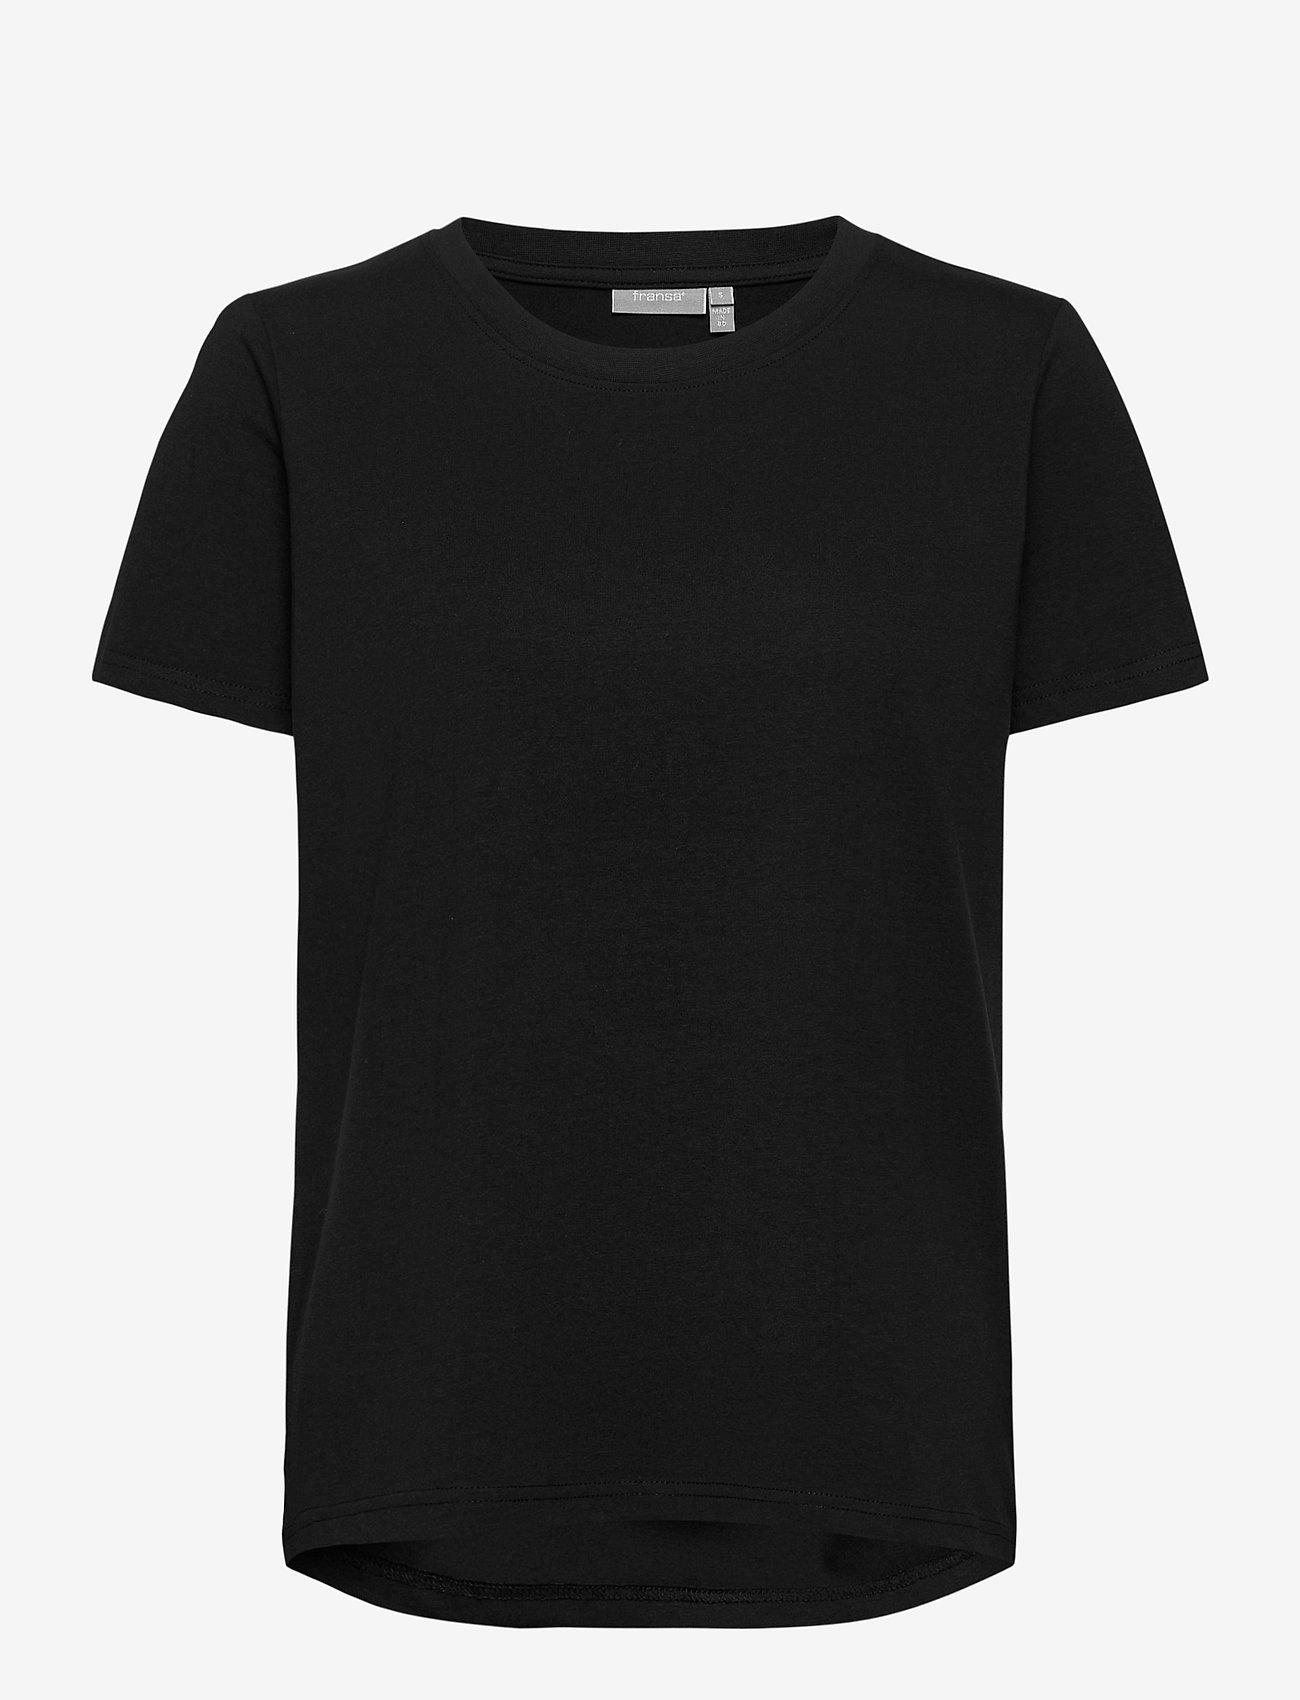 Fransa - Zashoulder 1 T-shirt - t-shirts - black - 0